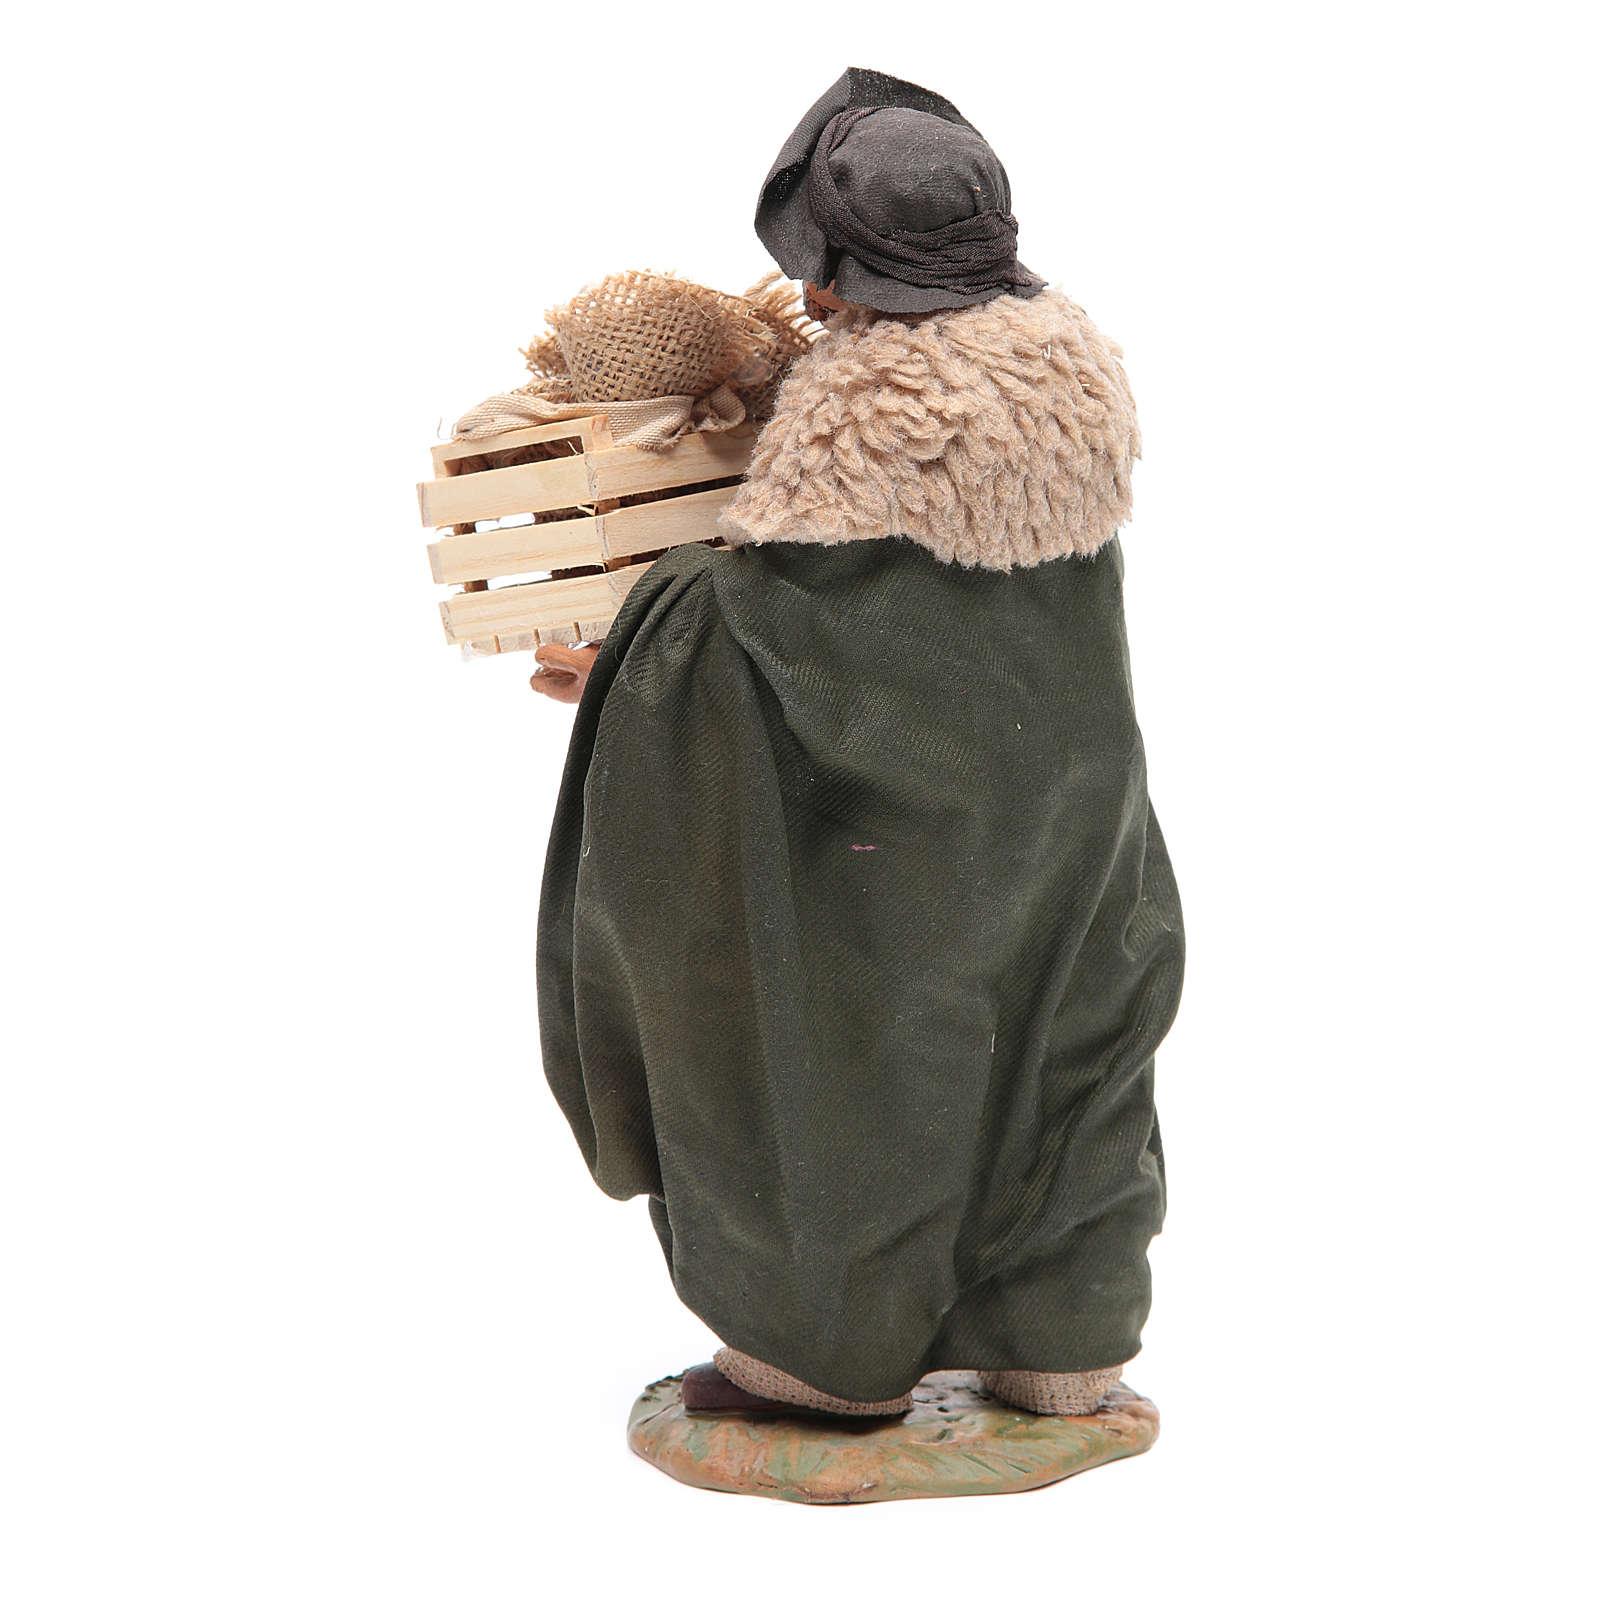 Man with basket 24 cm, Neapolitan Nativity scene 4